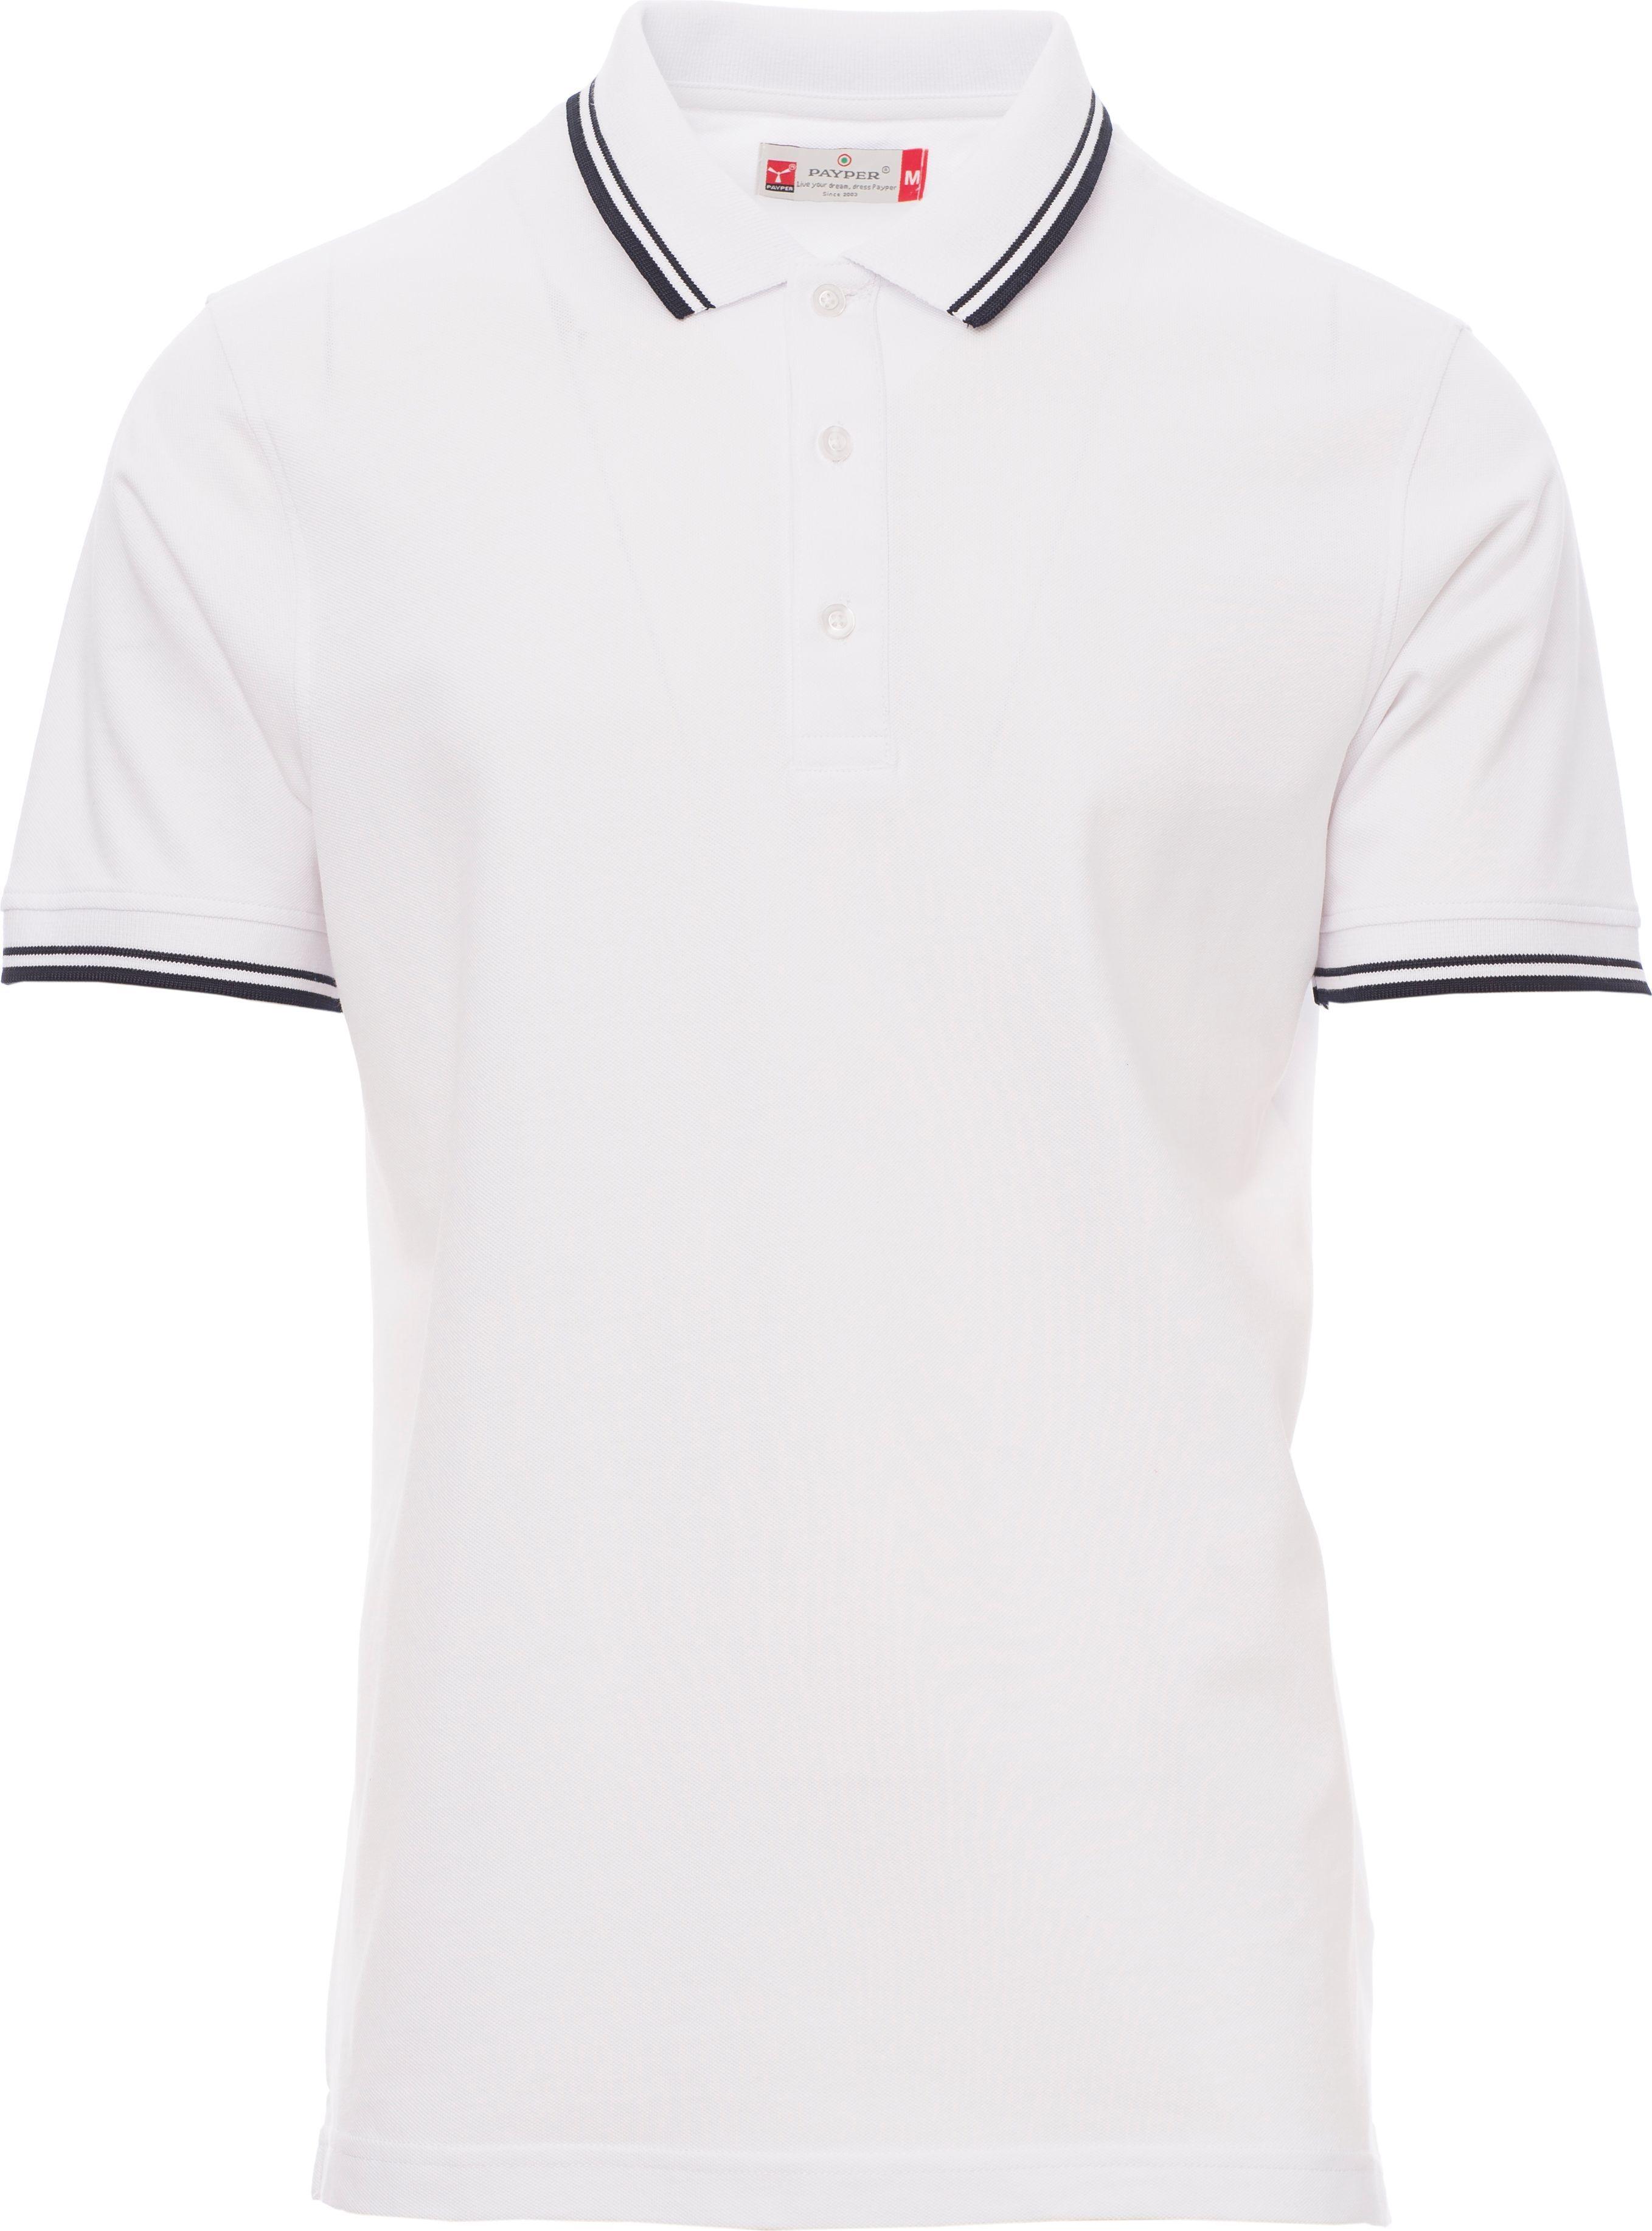 Polo homme Skipper - 32-1089-34